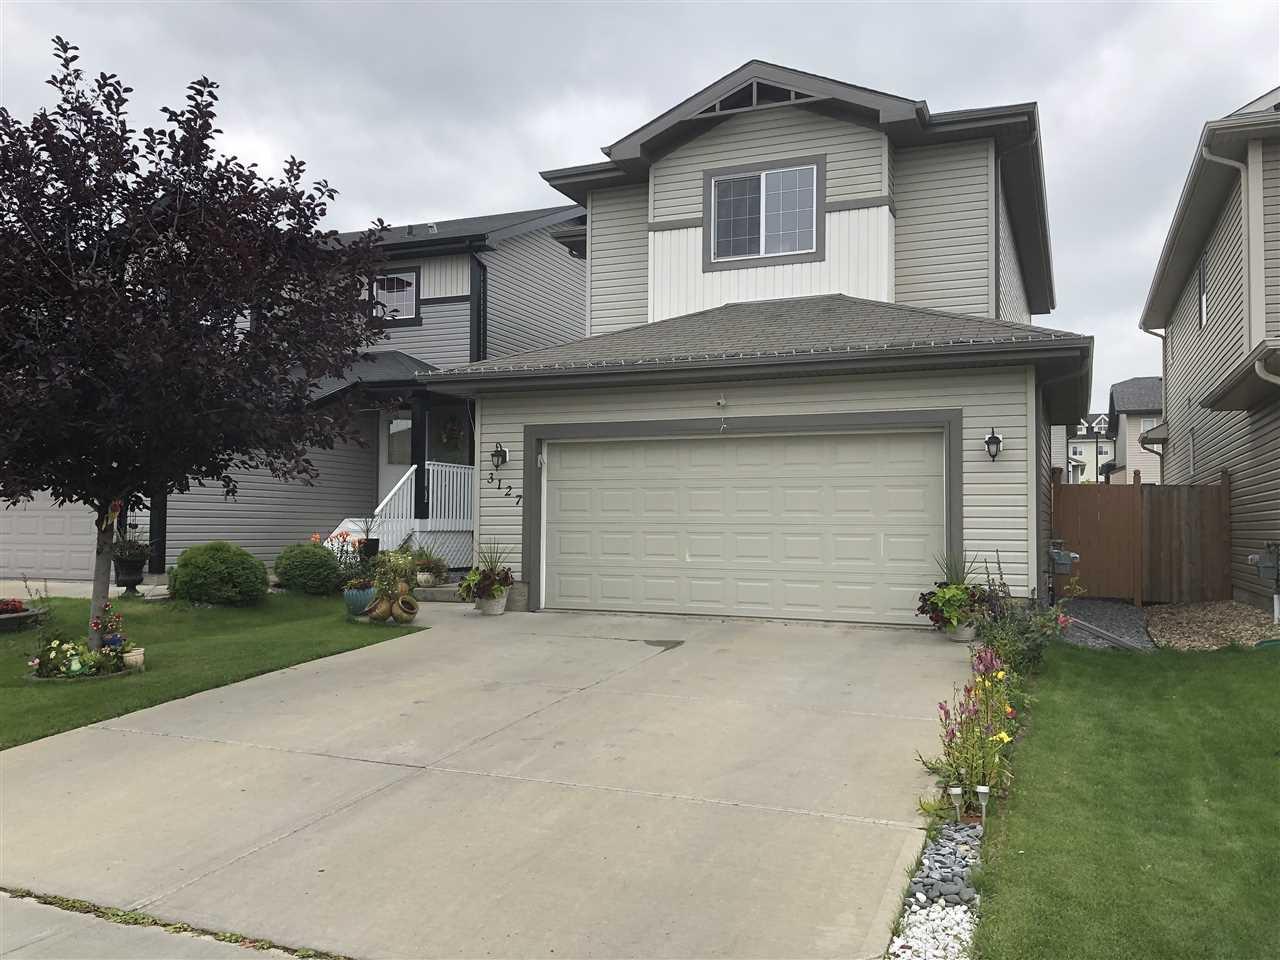 Main Photo: 3127 25 Avenue in Edmonton: Zone 30 House for sale : MLS®# E4196171